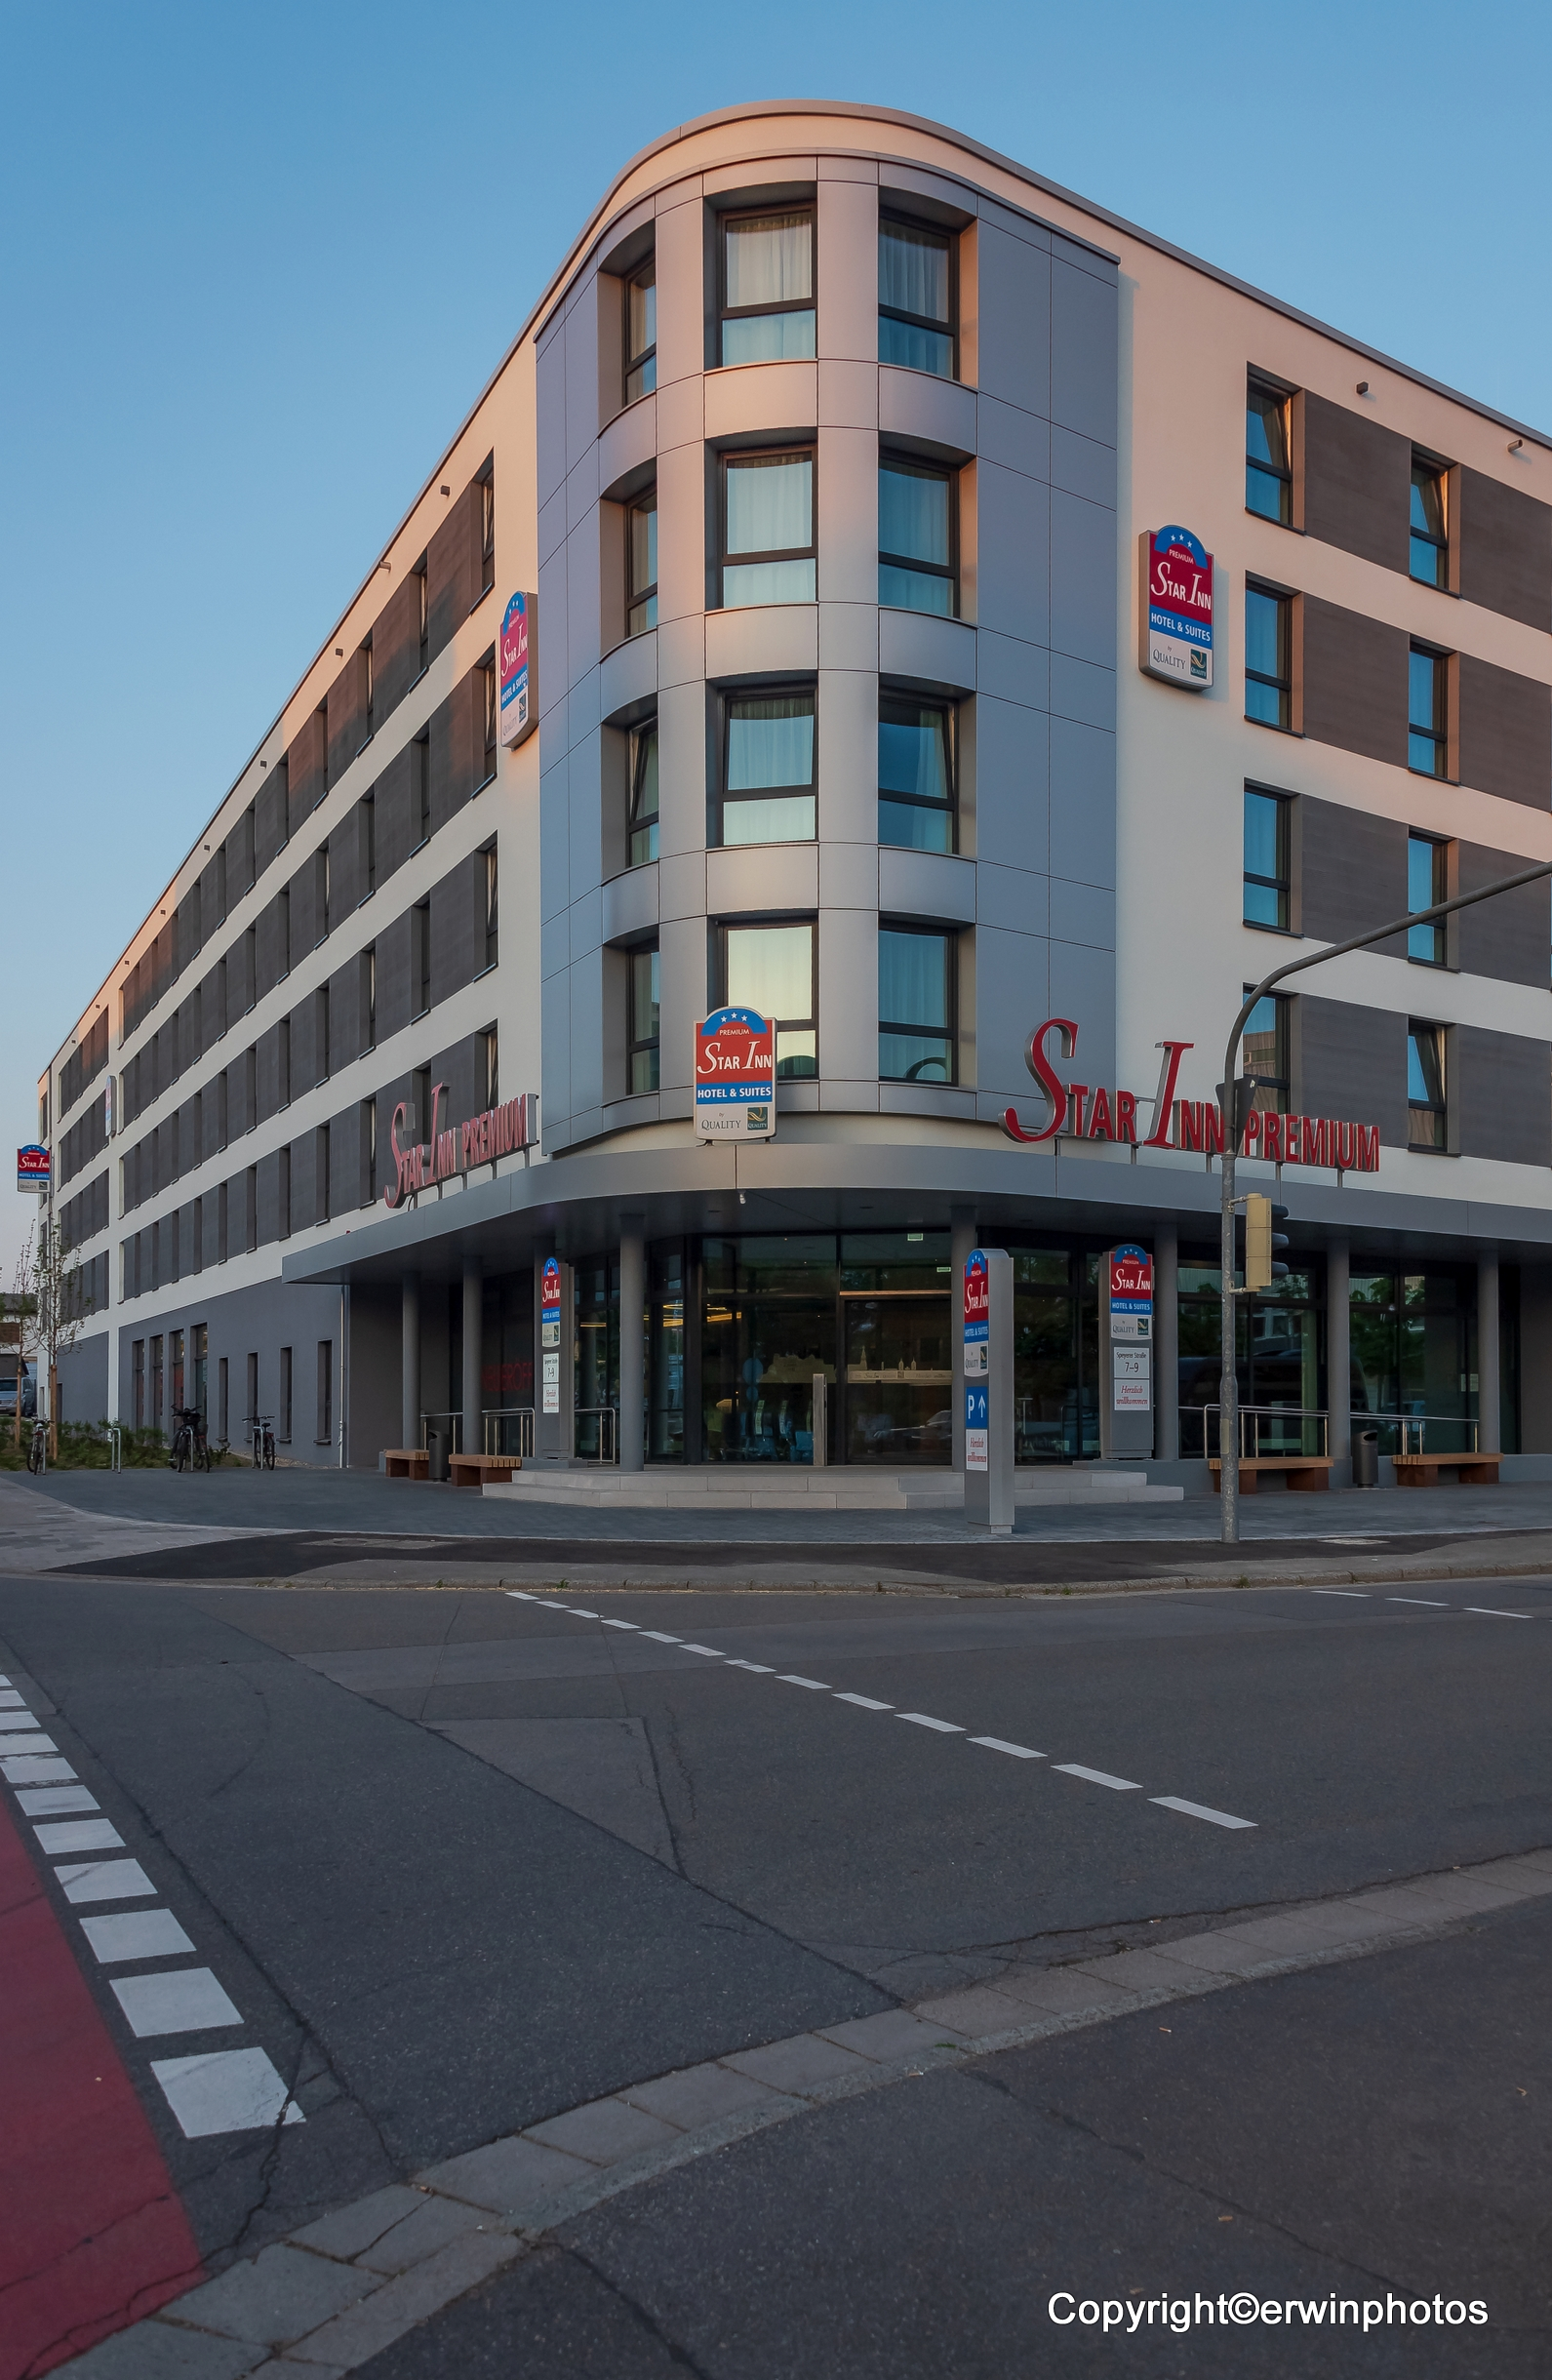 das Hotel Star Inn in Heidelberg